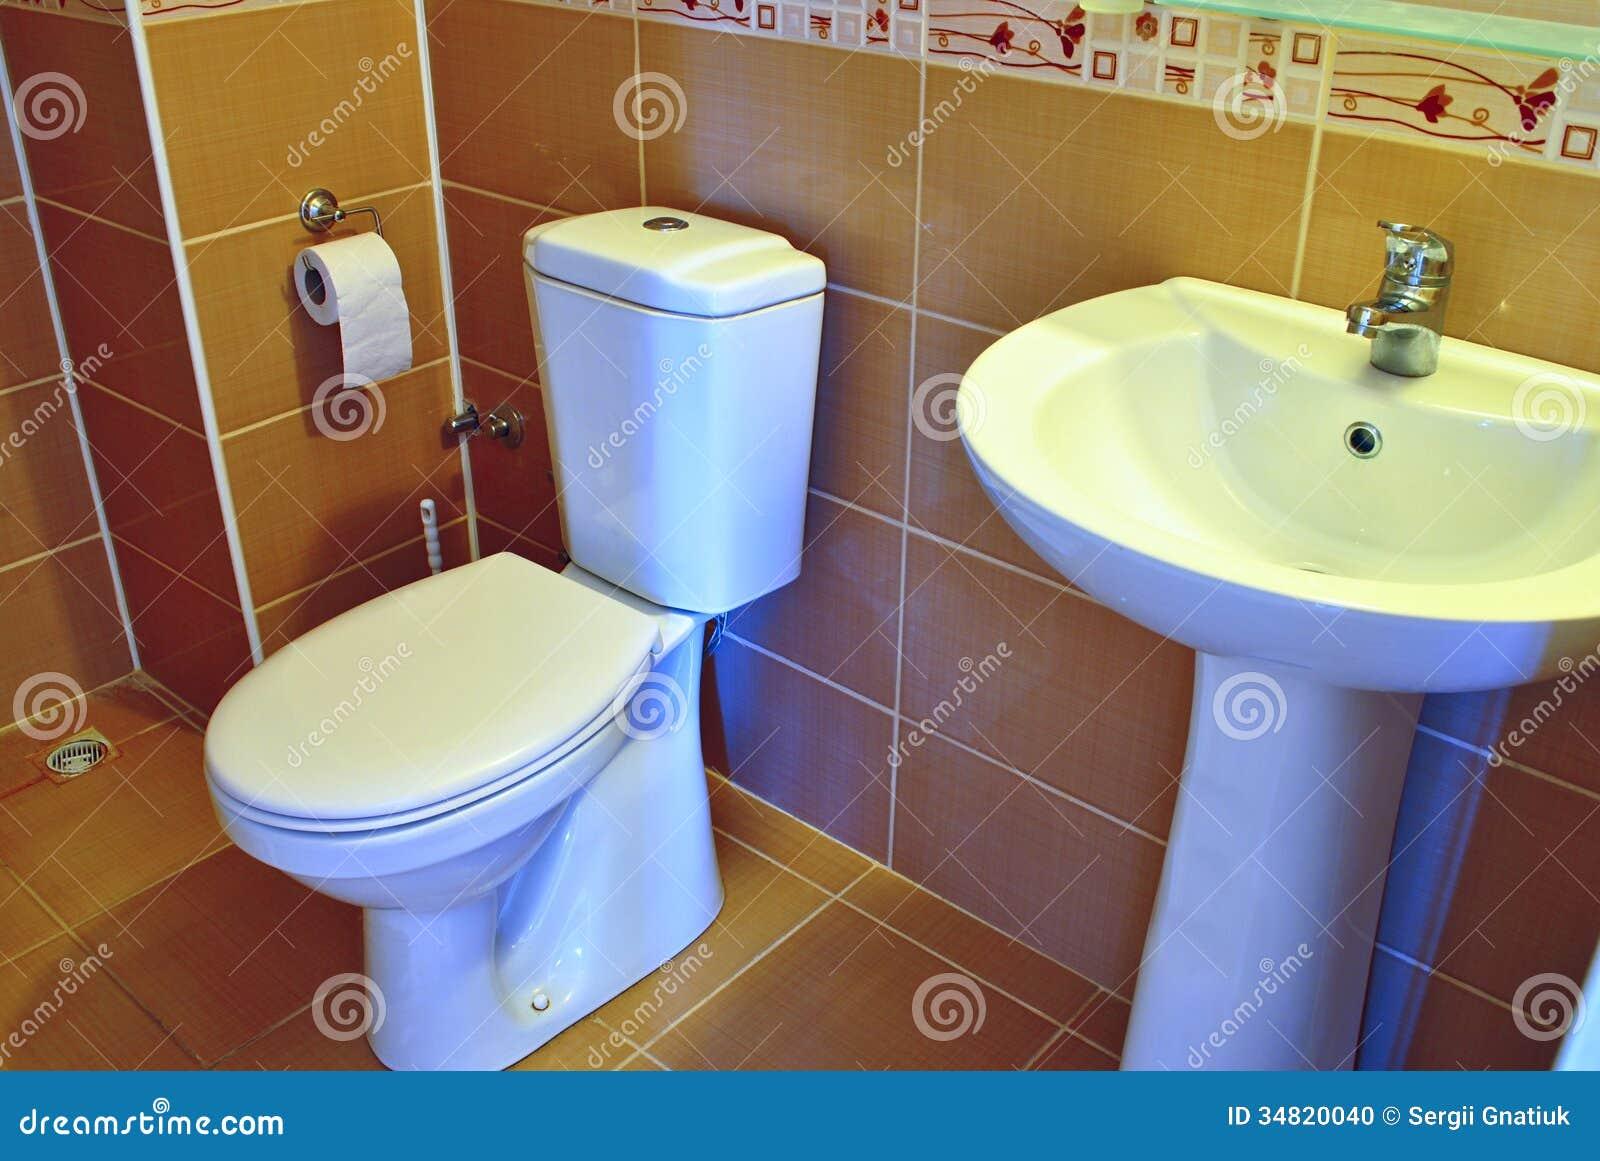 modern hand basin and toilet stock photo  image  - basin bathroom fixtures hand hotel house interior modern